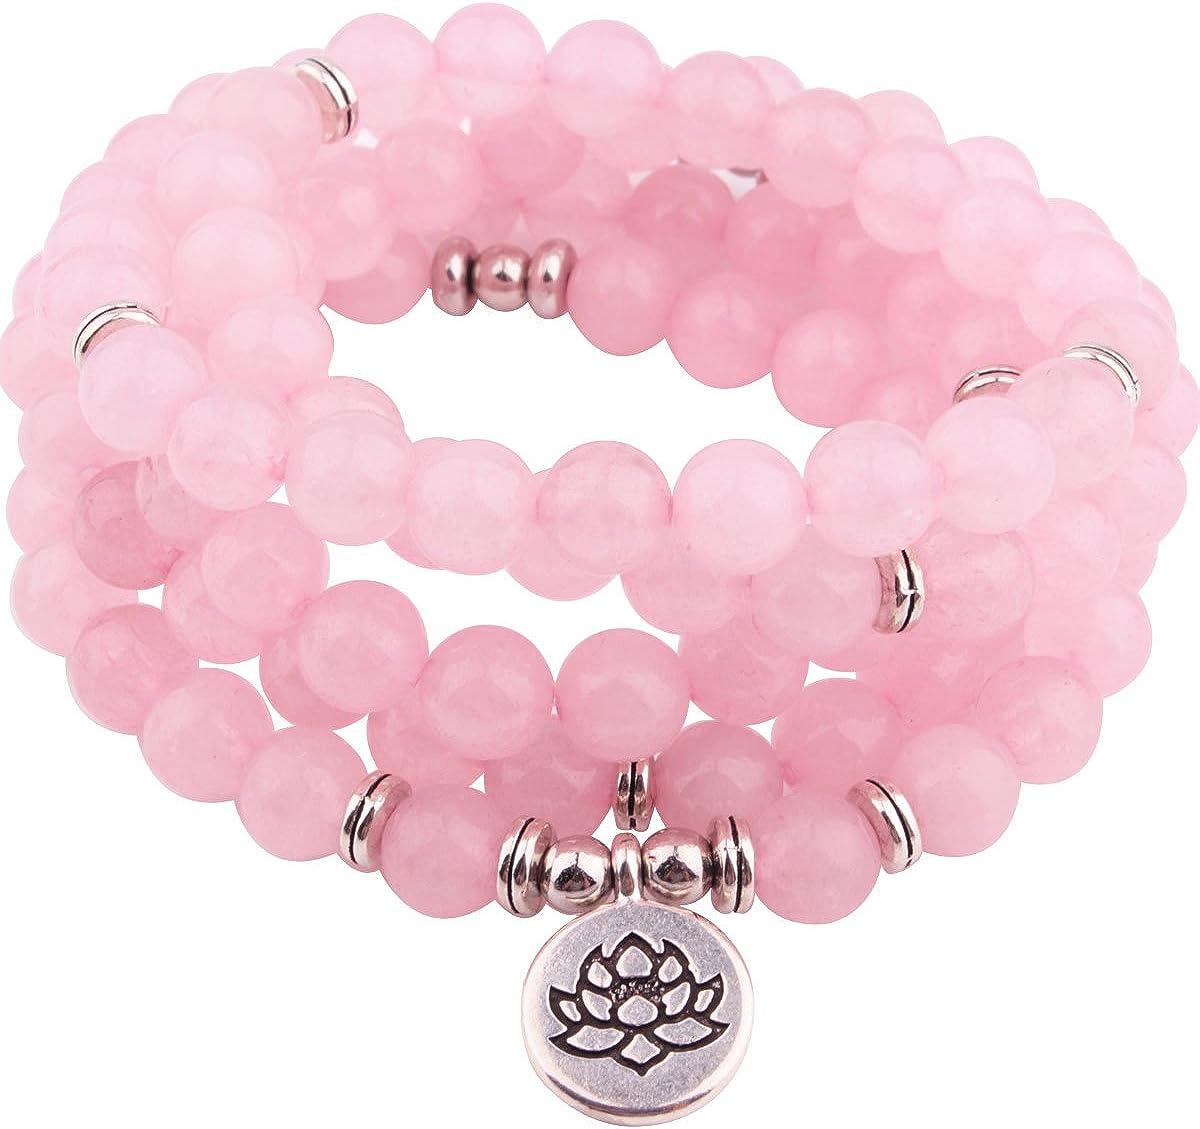 GVUSMIL 8mm 108 Mala Beads Envolver Pulsera Collar para Yoga Encanto Pulsera Natural Piedra Preciosa Joyería para Mujer Hombres